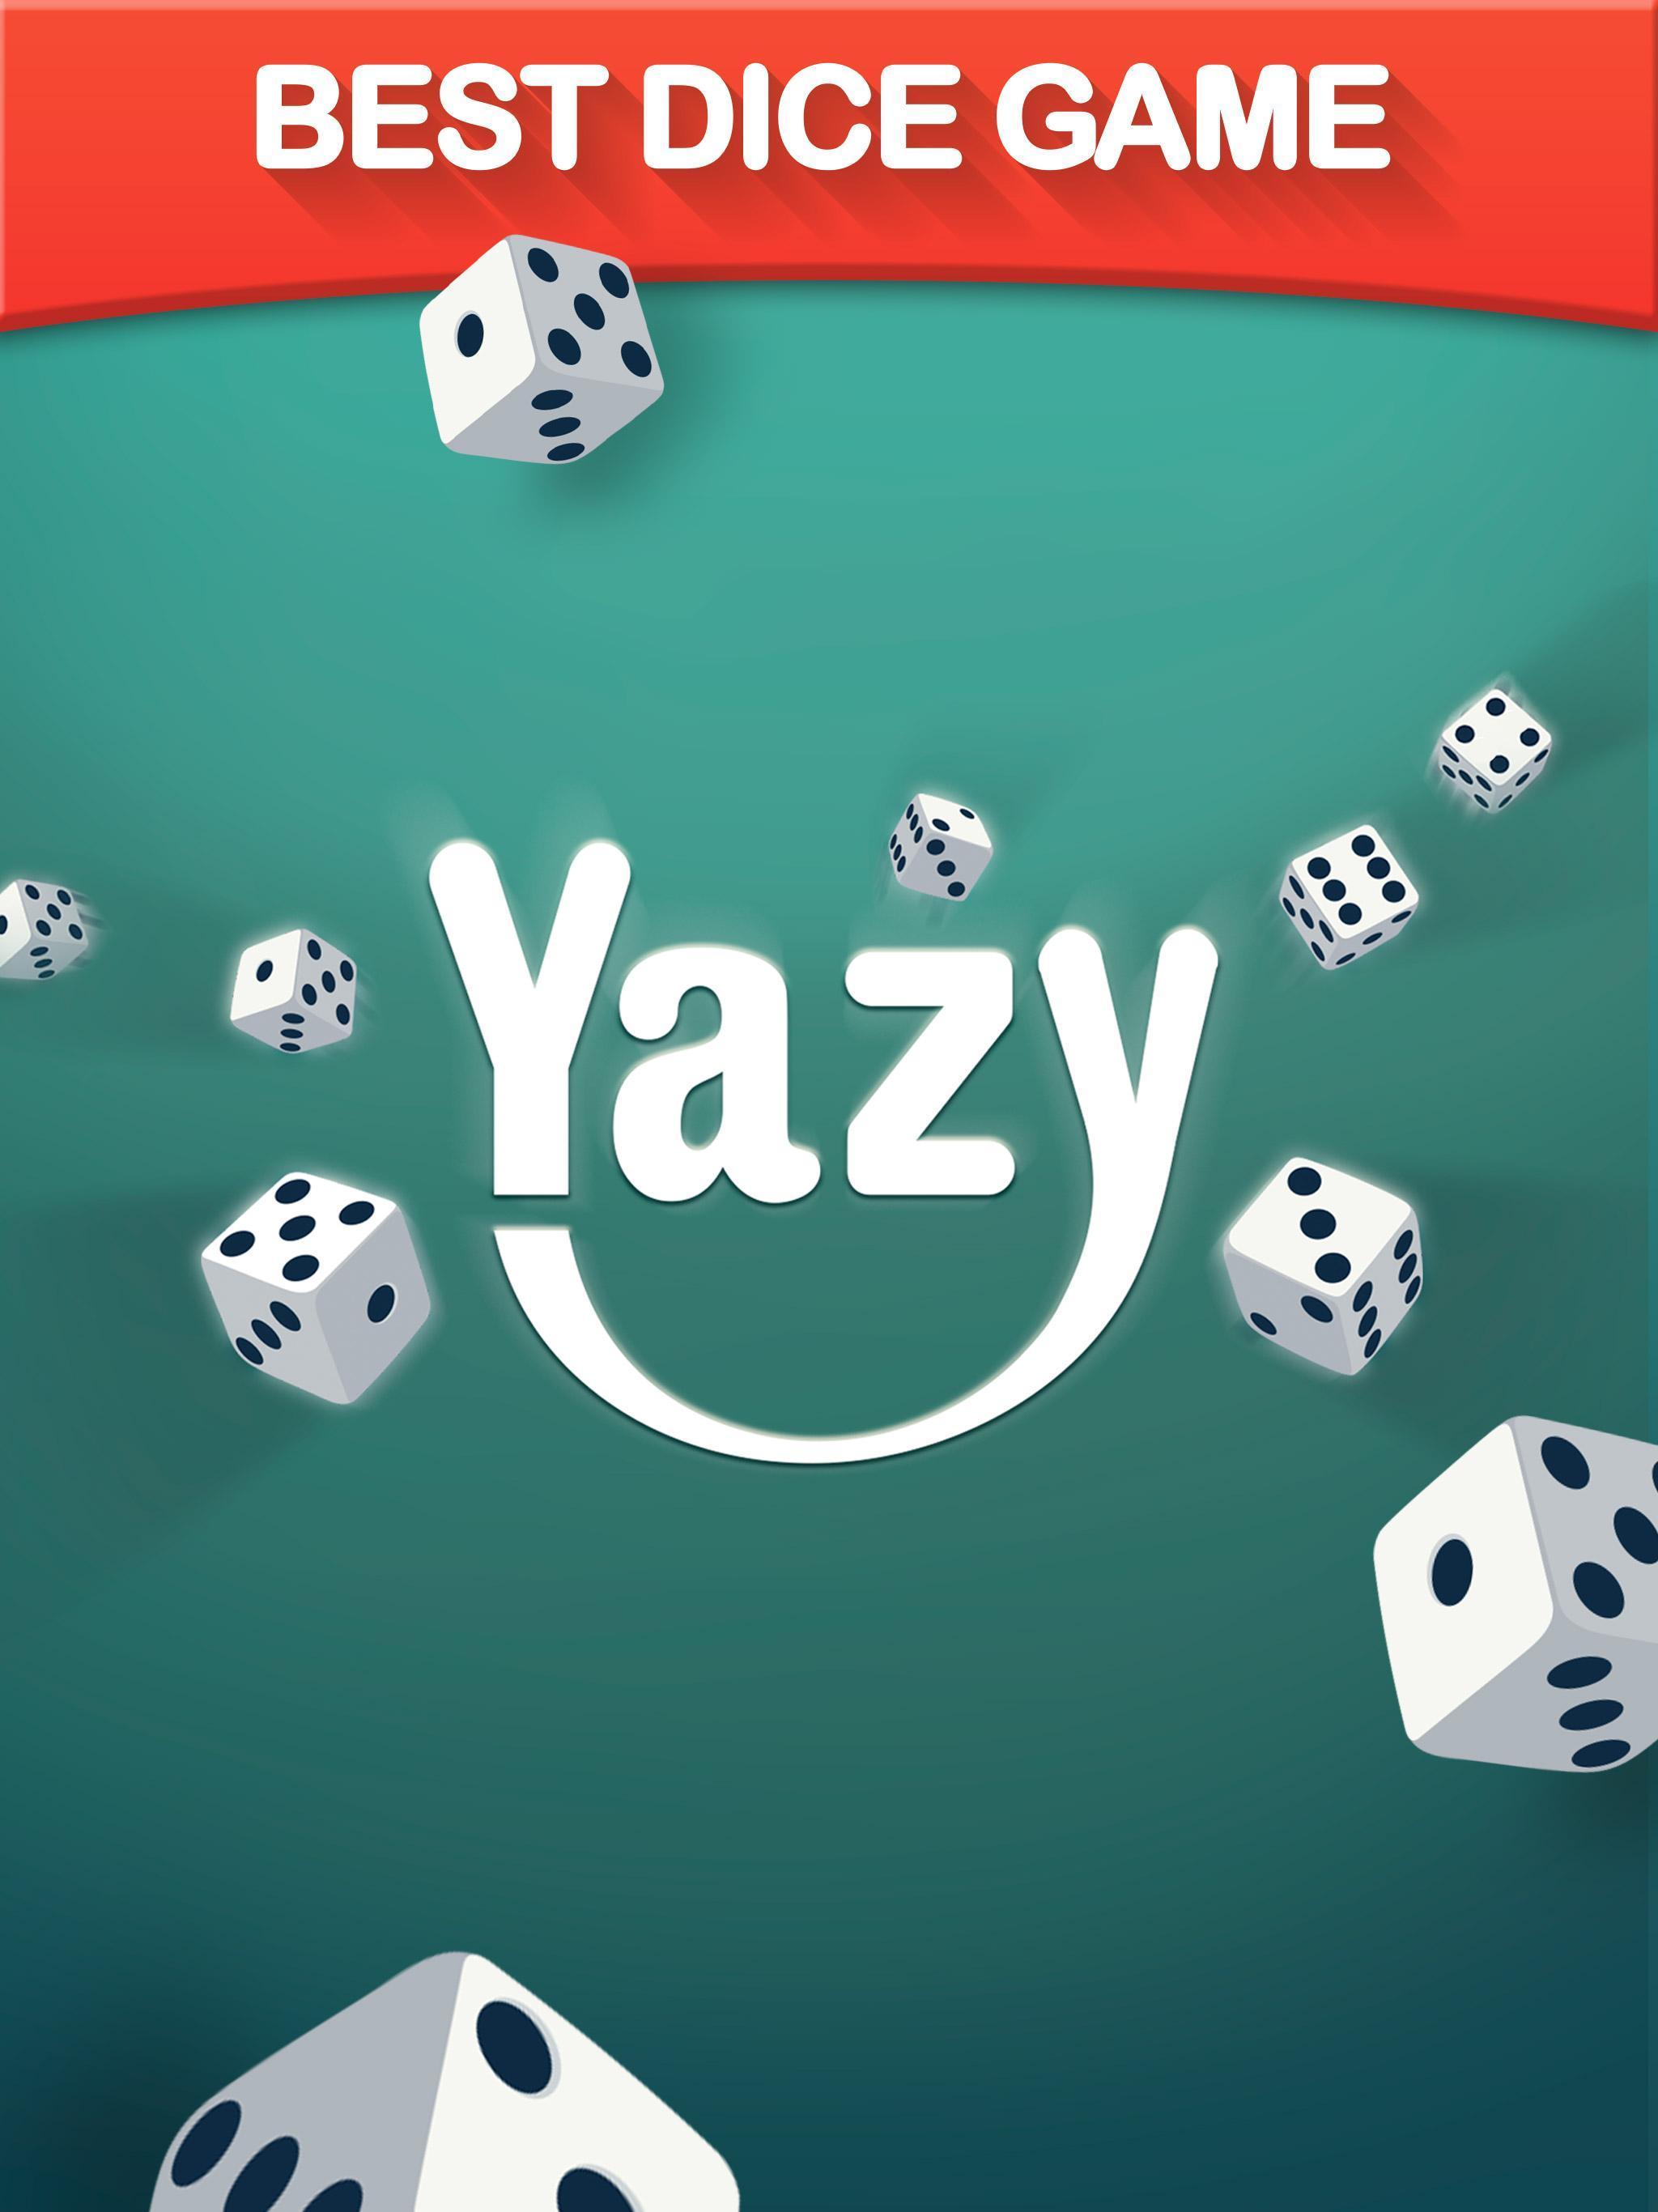 Yazy the best yatzy dice game 1.0.36 Screenshot 10